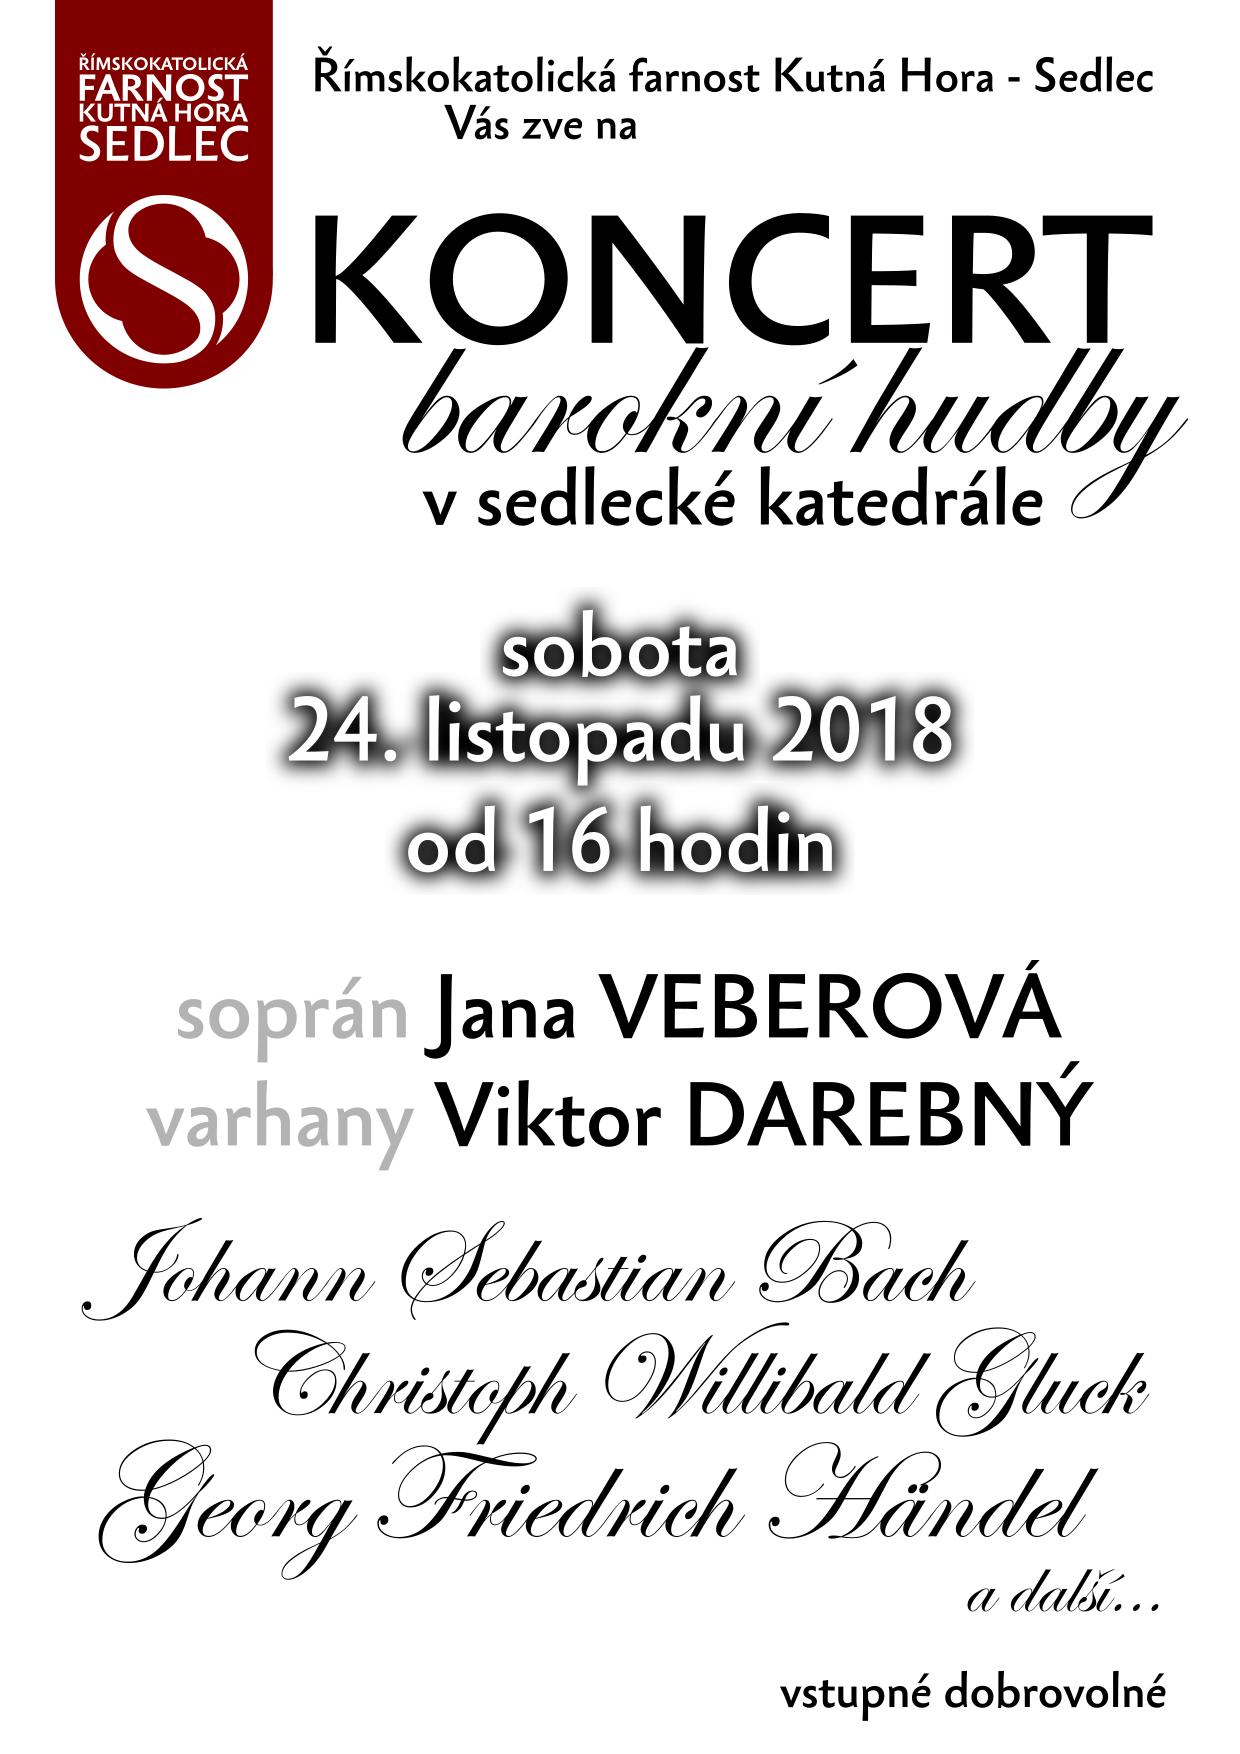 4610-plakat-koncert-pm-24-11-2018.png